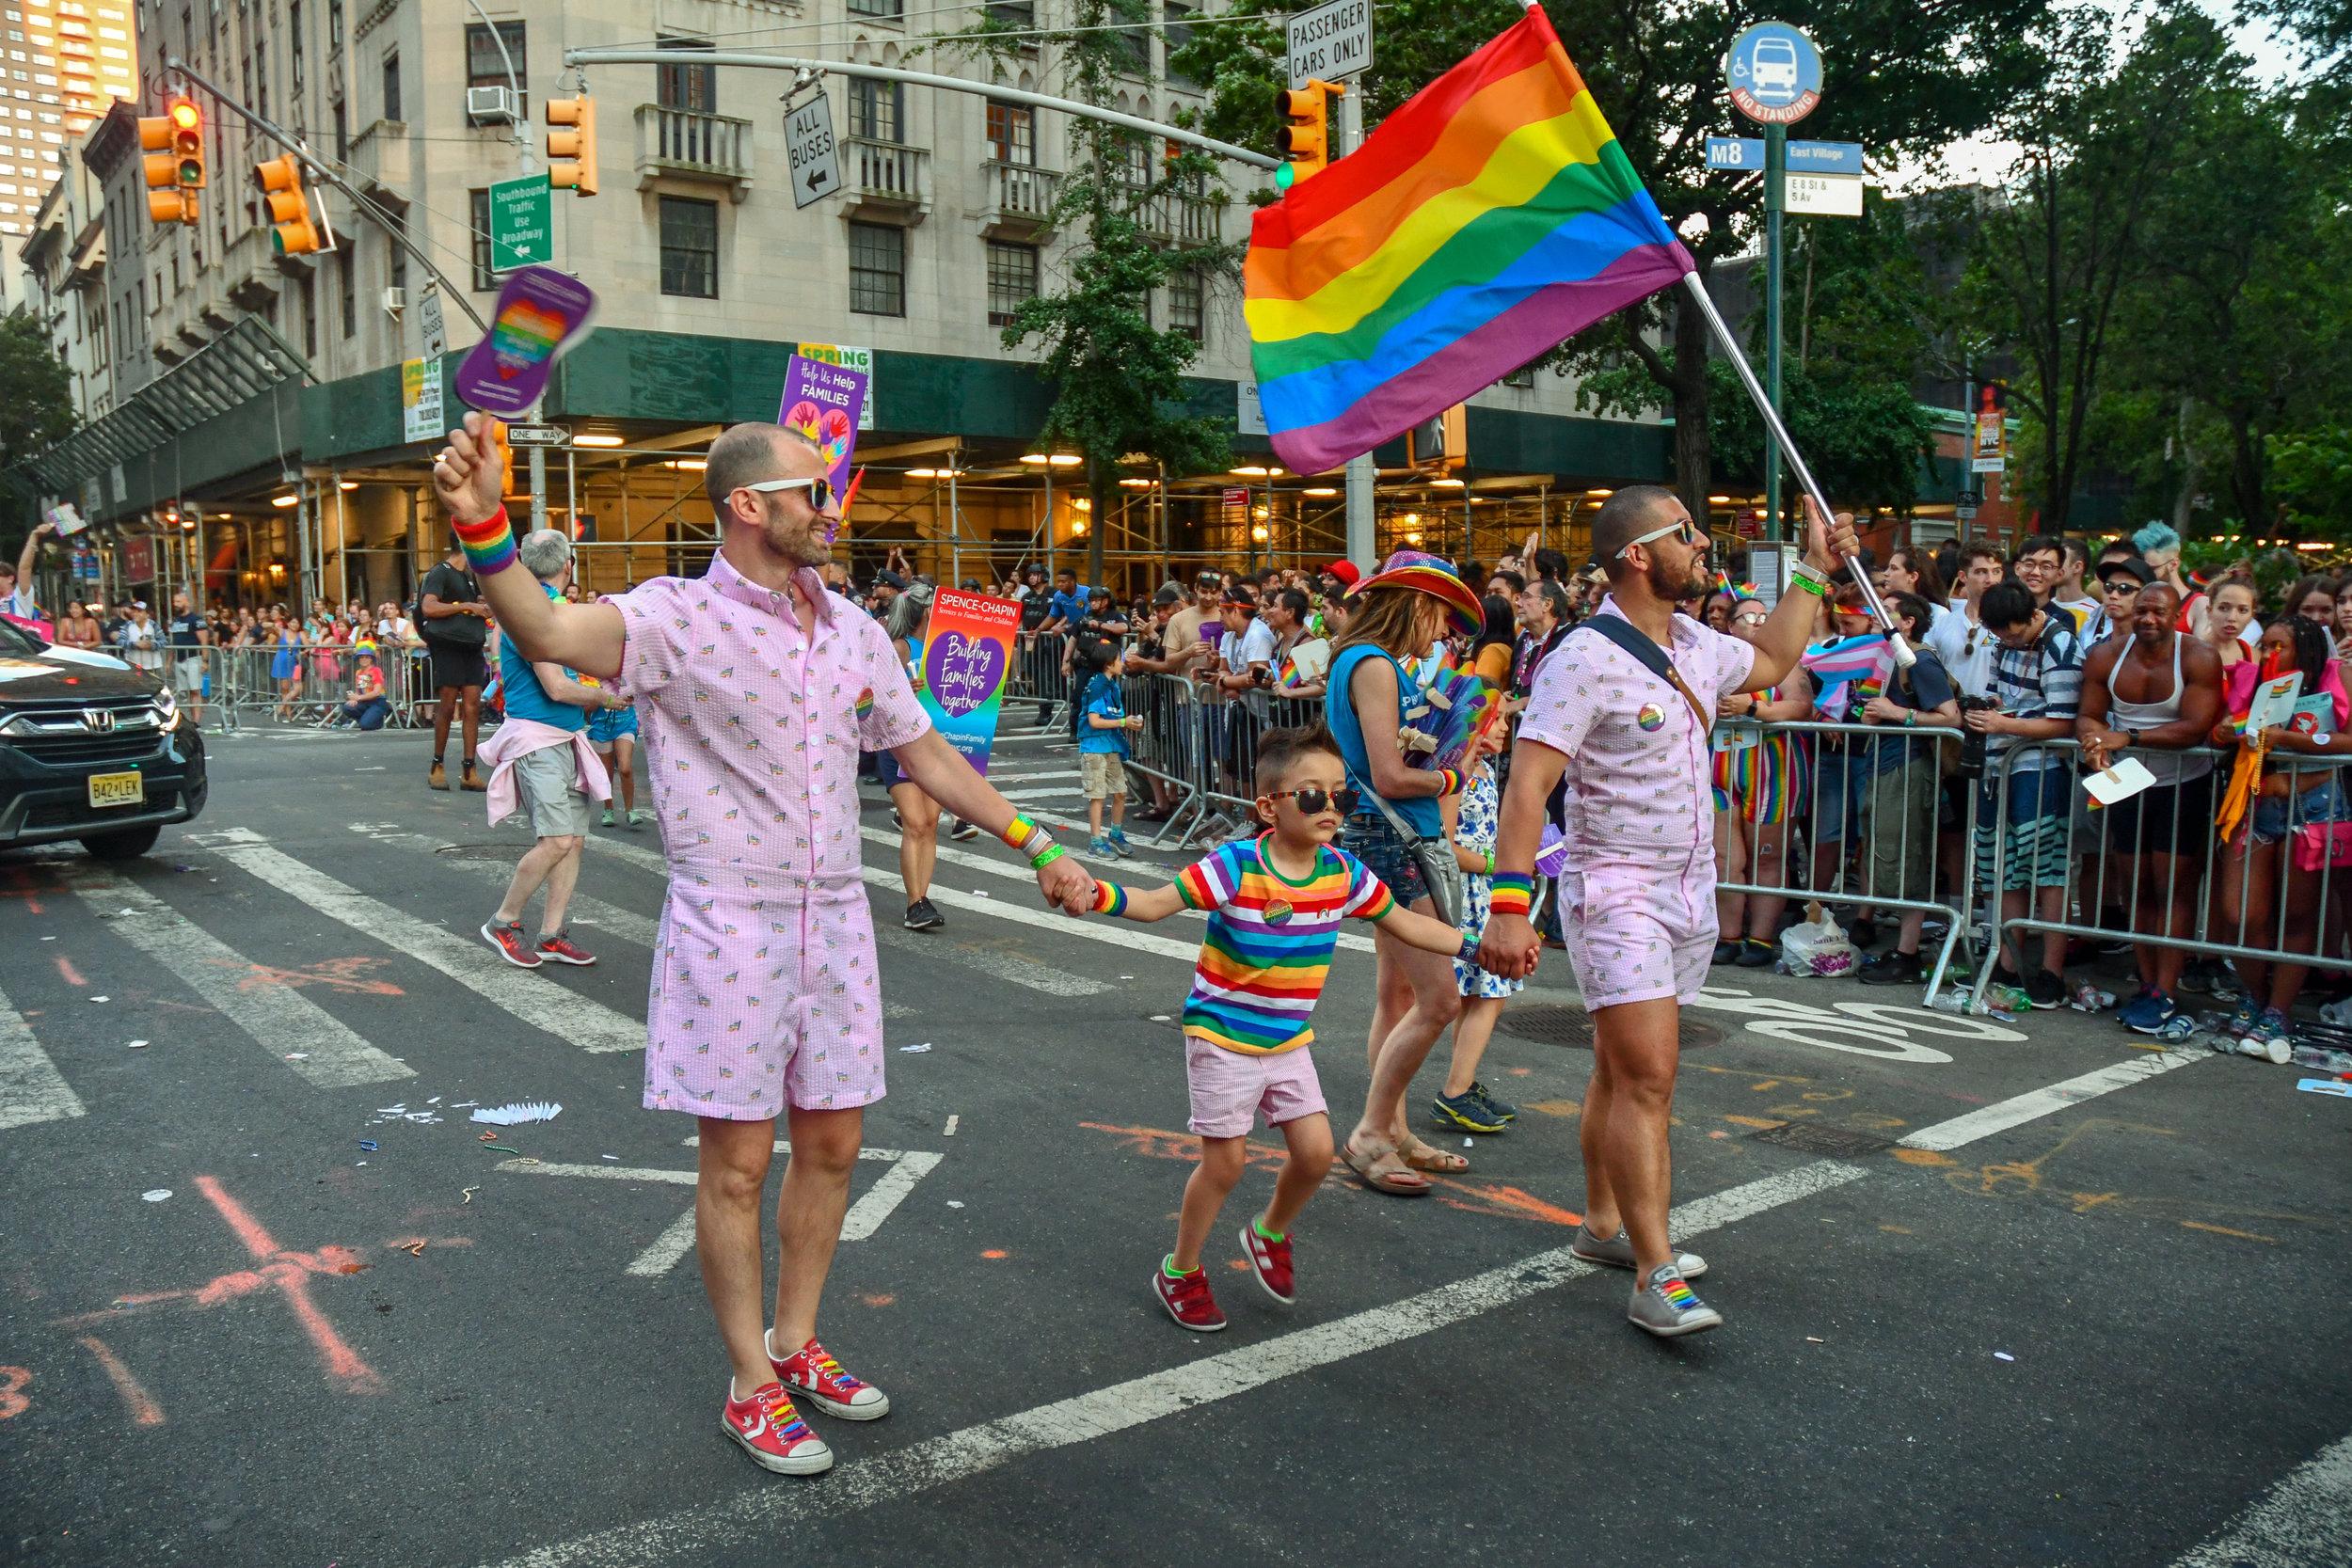 SC-PrideParade-2019_FE-261.jpg